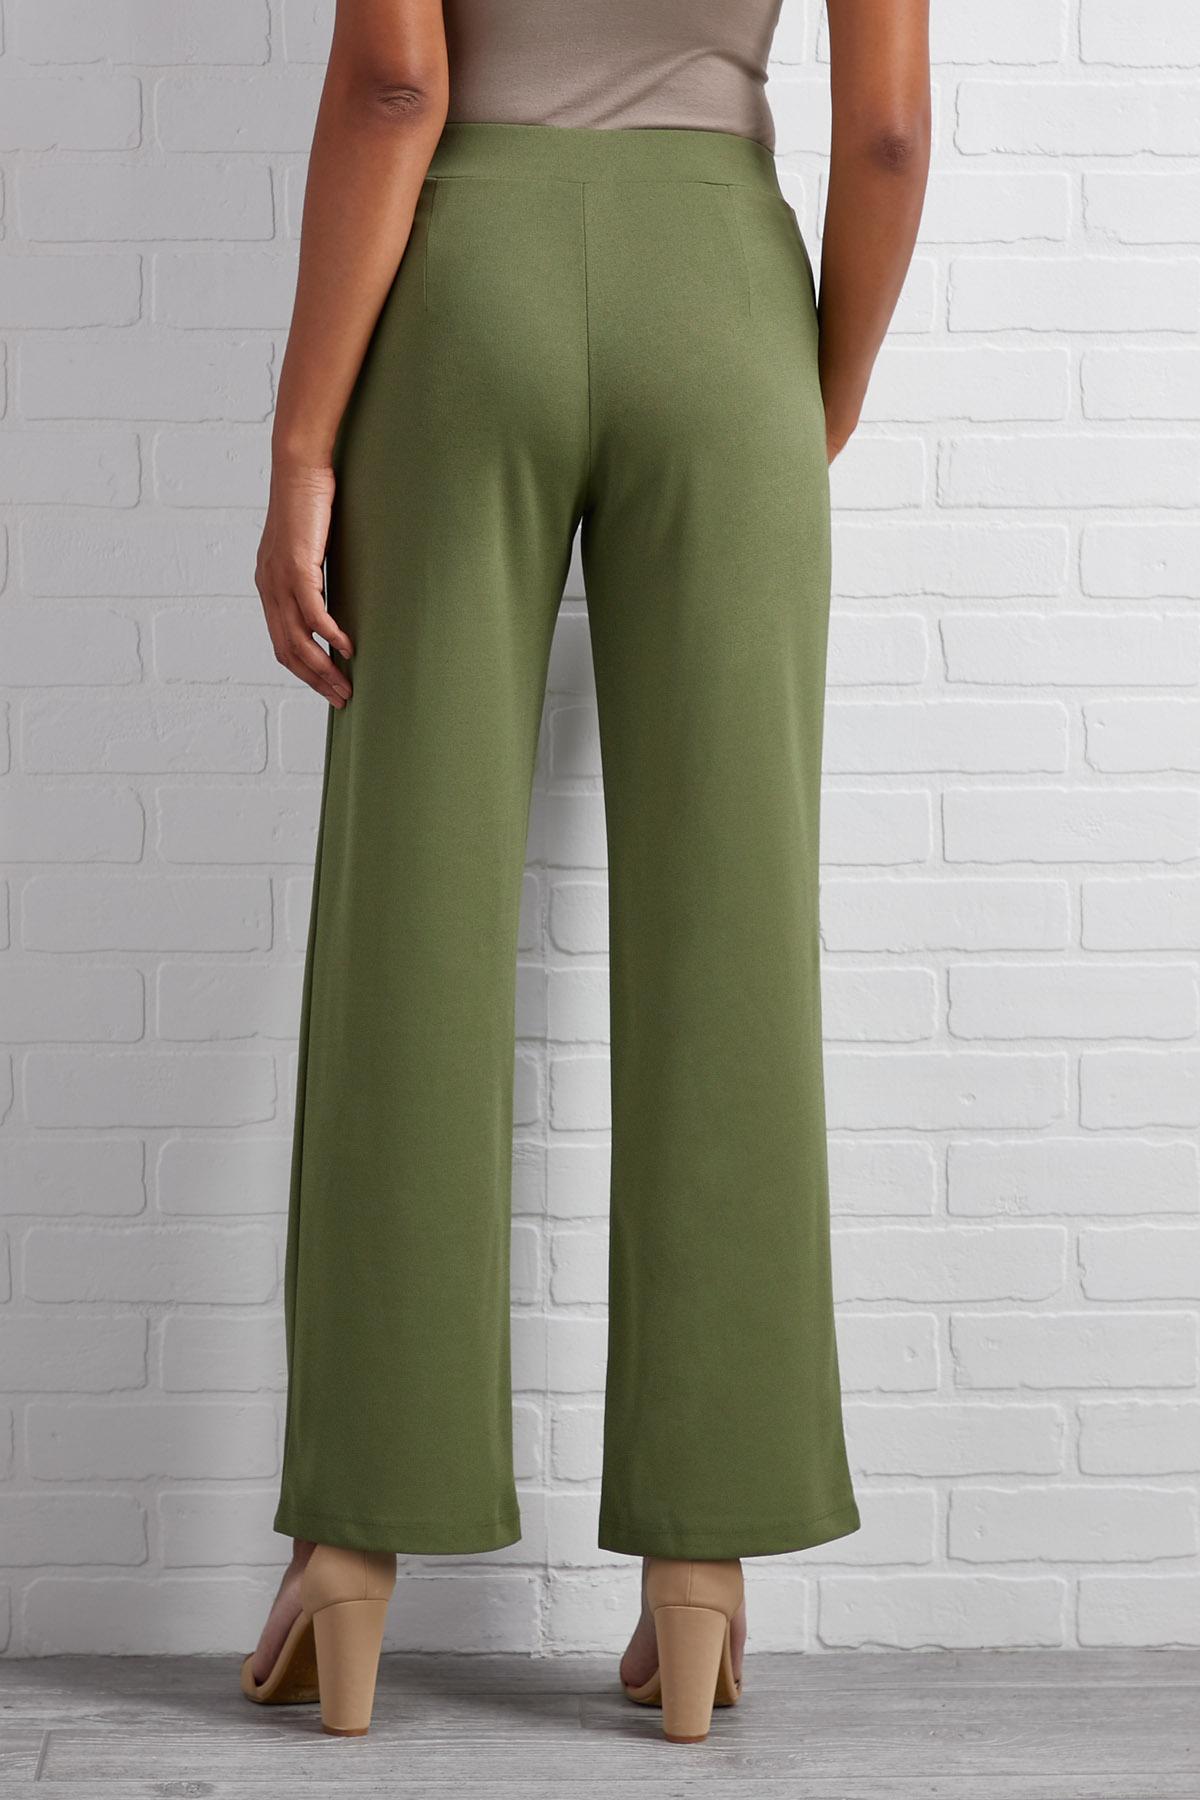 Cute As A Button Pants